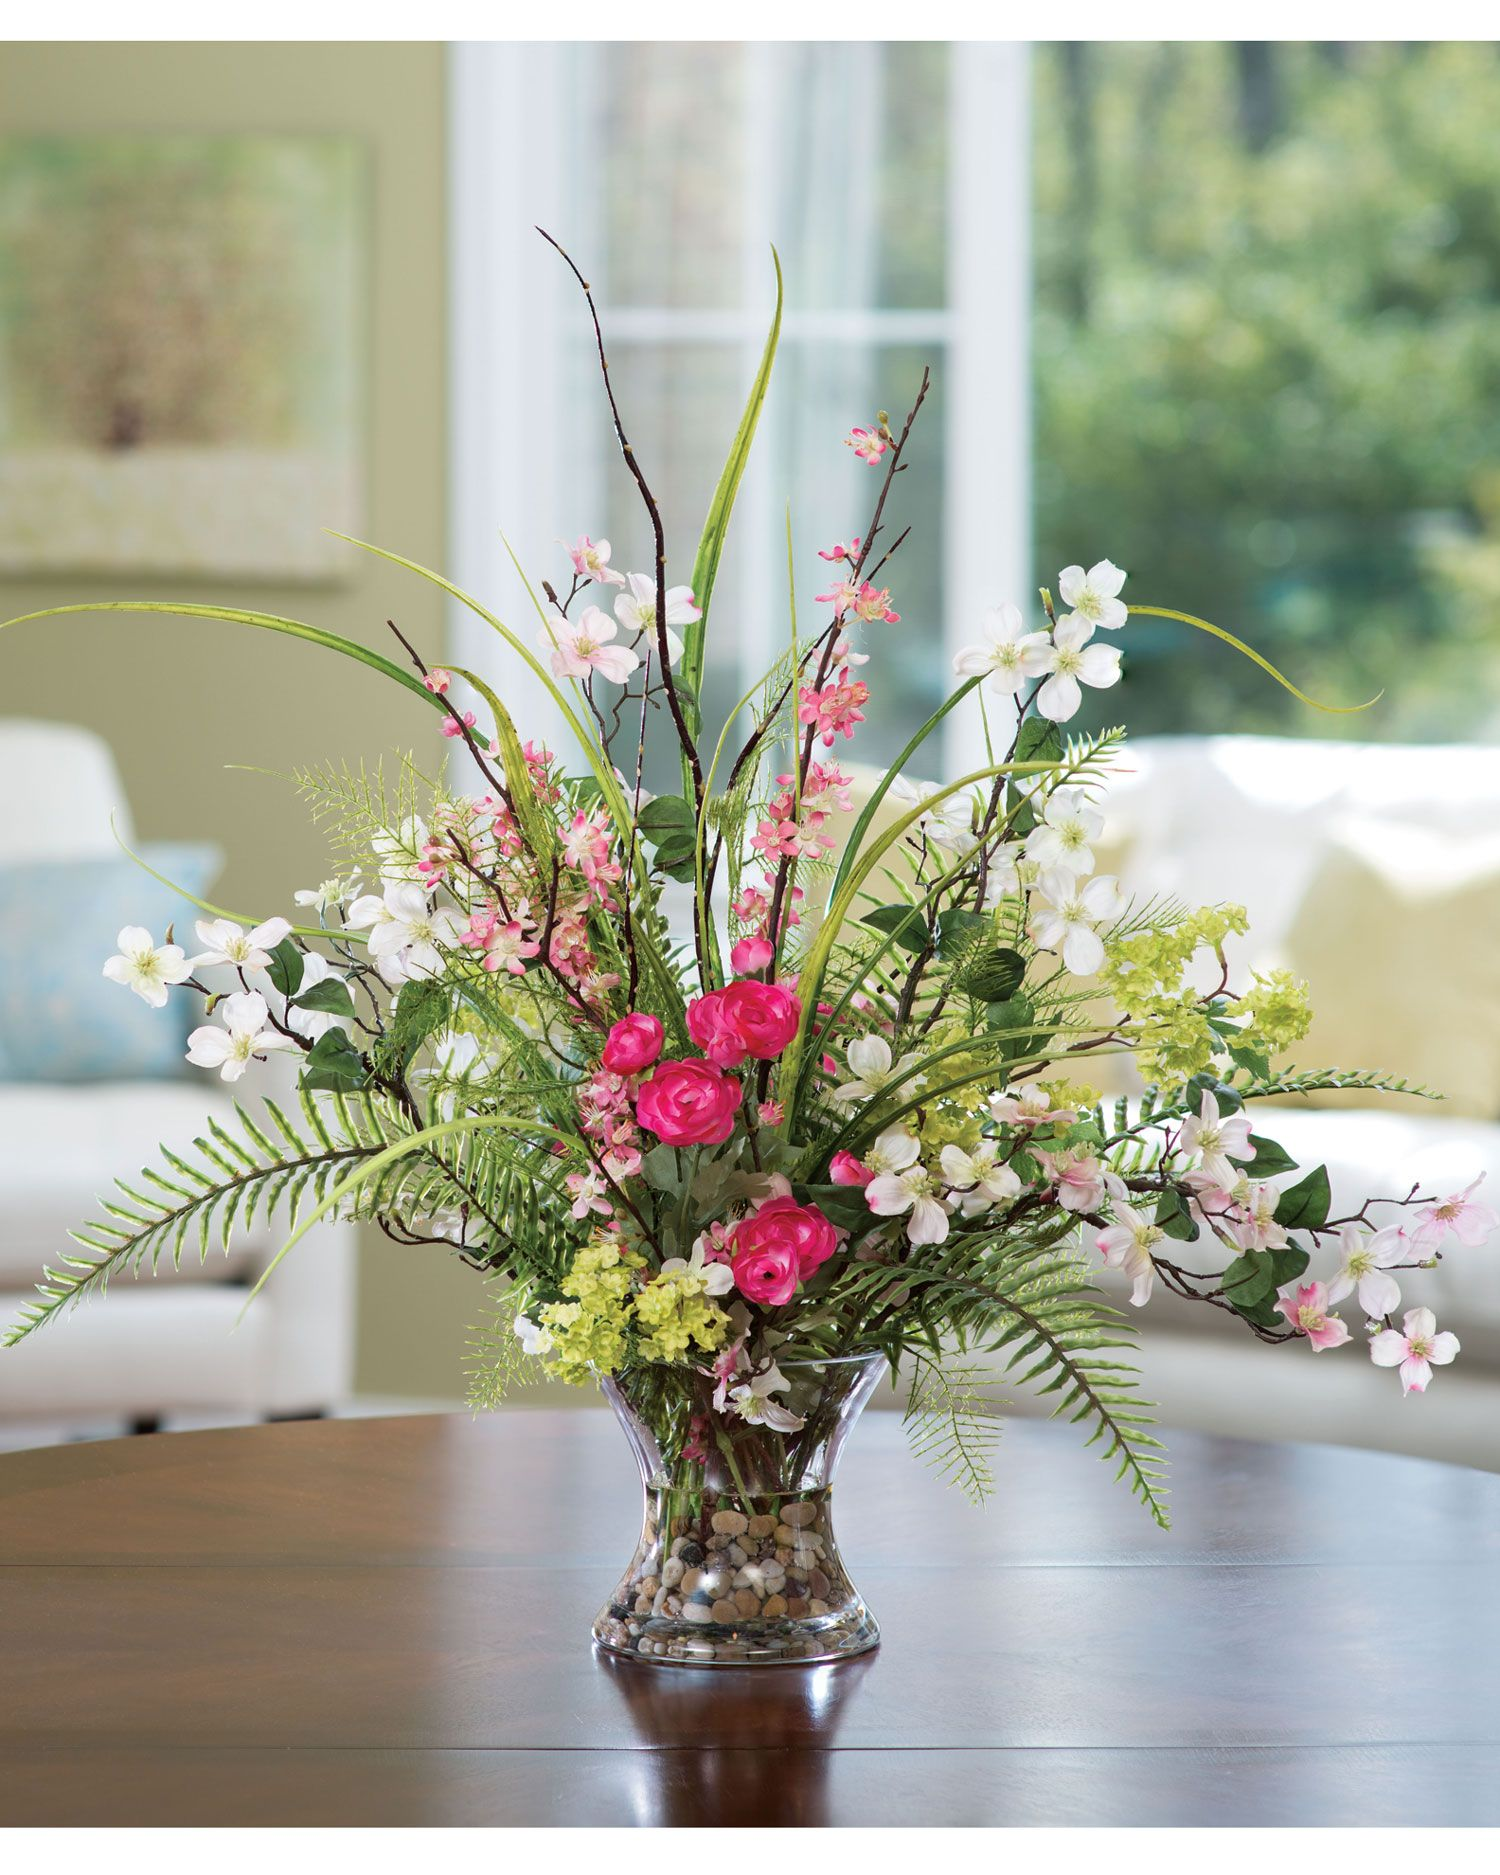 Artificial Flower Decoration: Spring Decorating With Dogwood, Ranunculus & Fern Silk